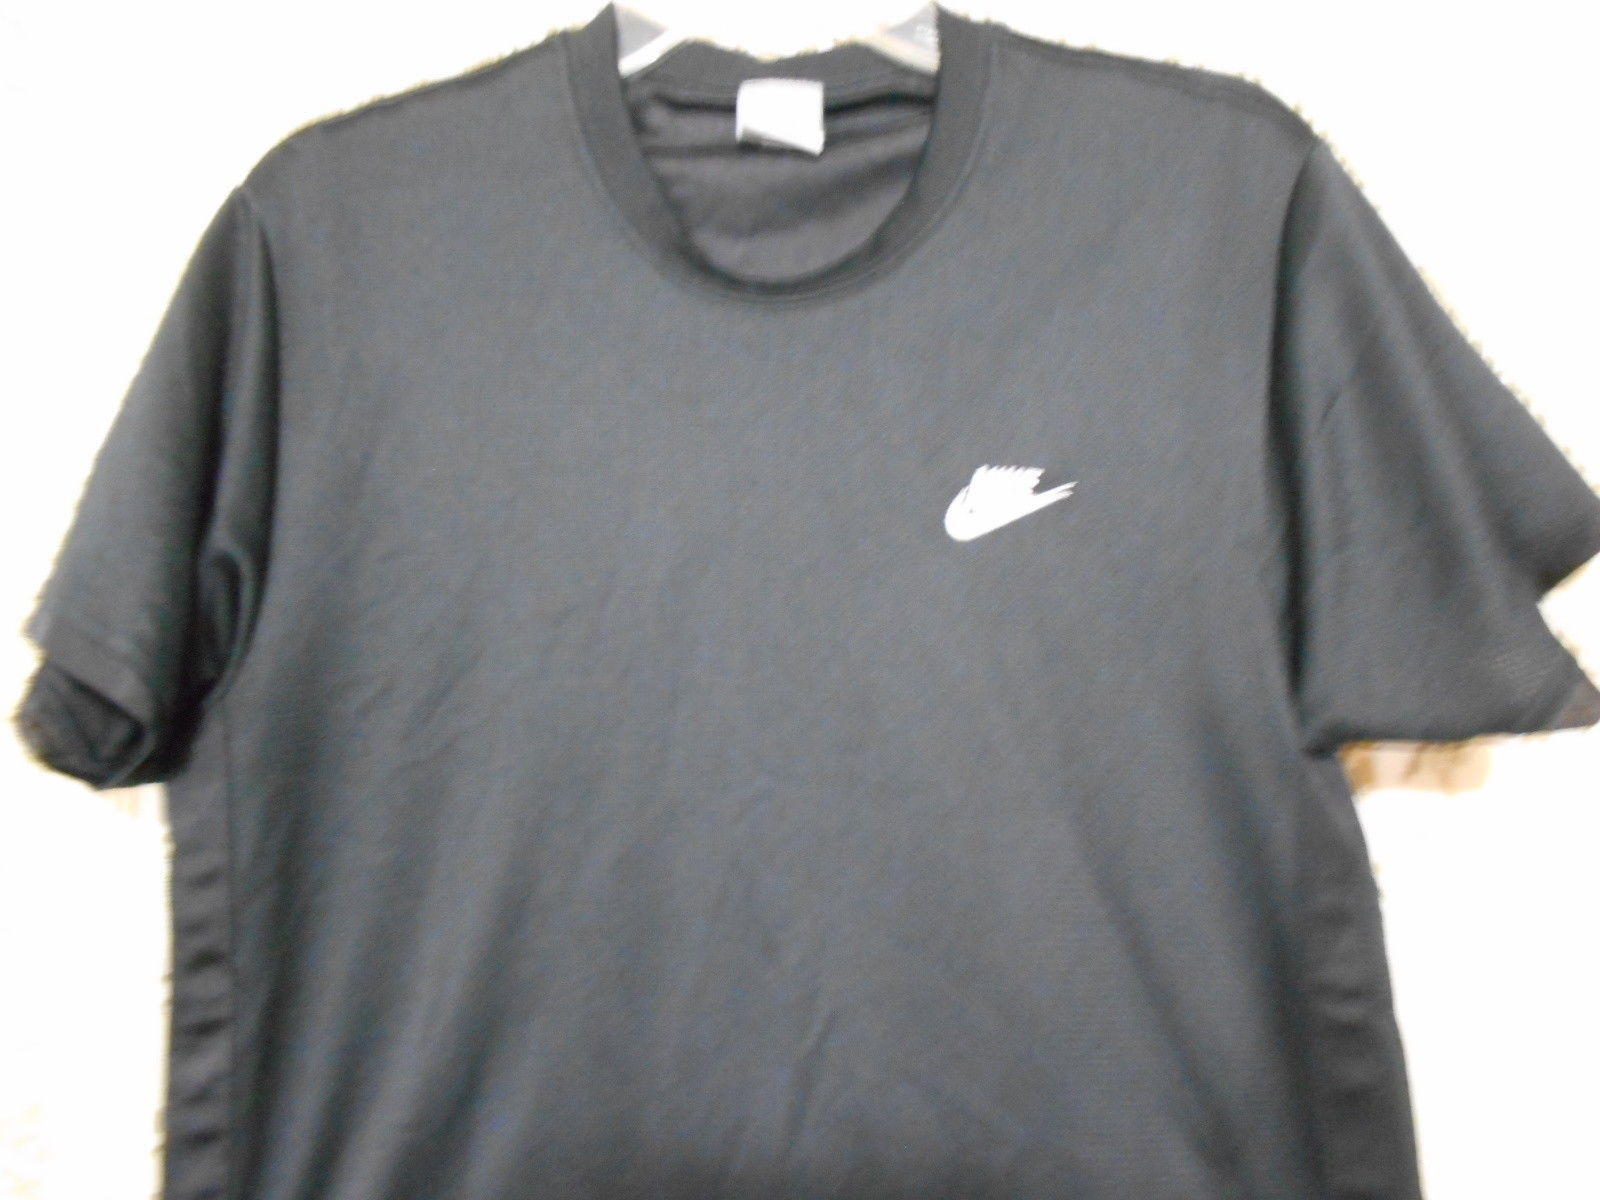 Nike  Men's Black Polyester Athletic Tee Shirt Size Medium